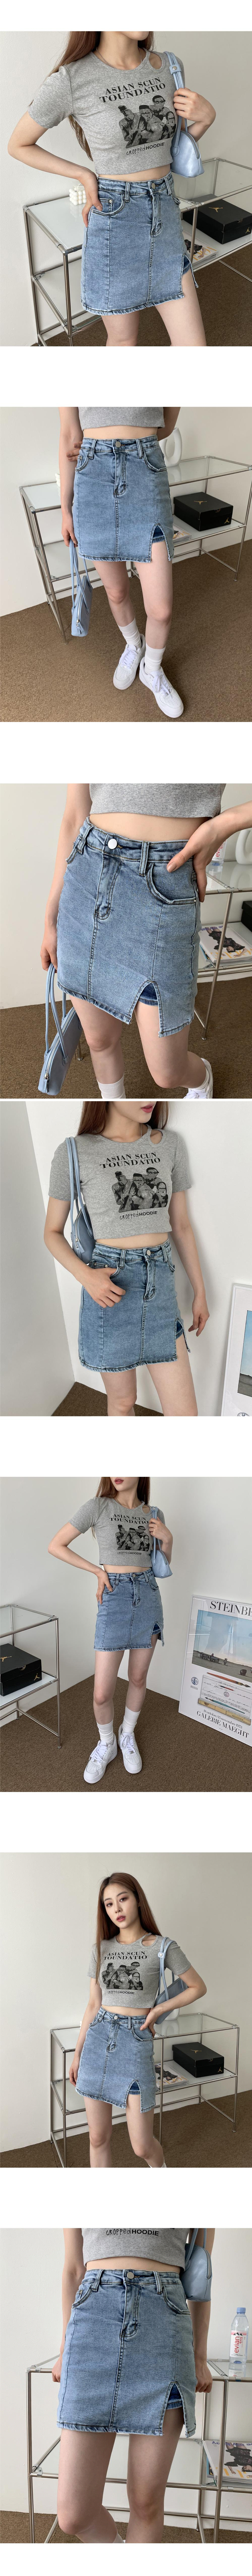 Ellie Spandex Split denim skirt